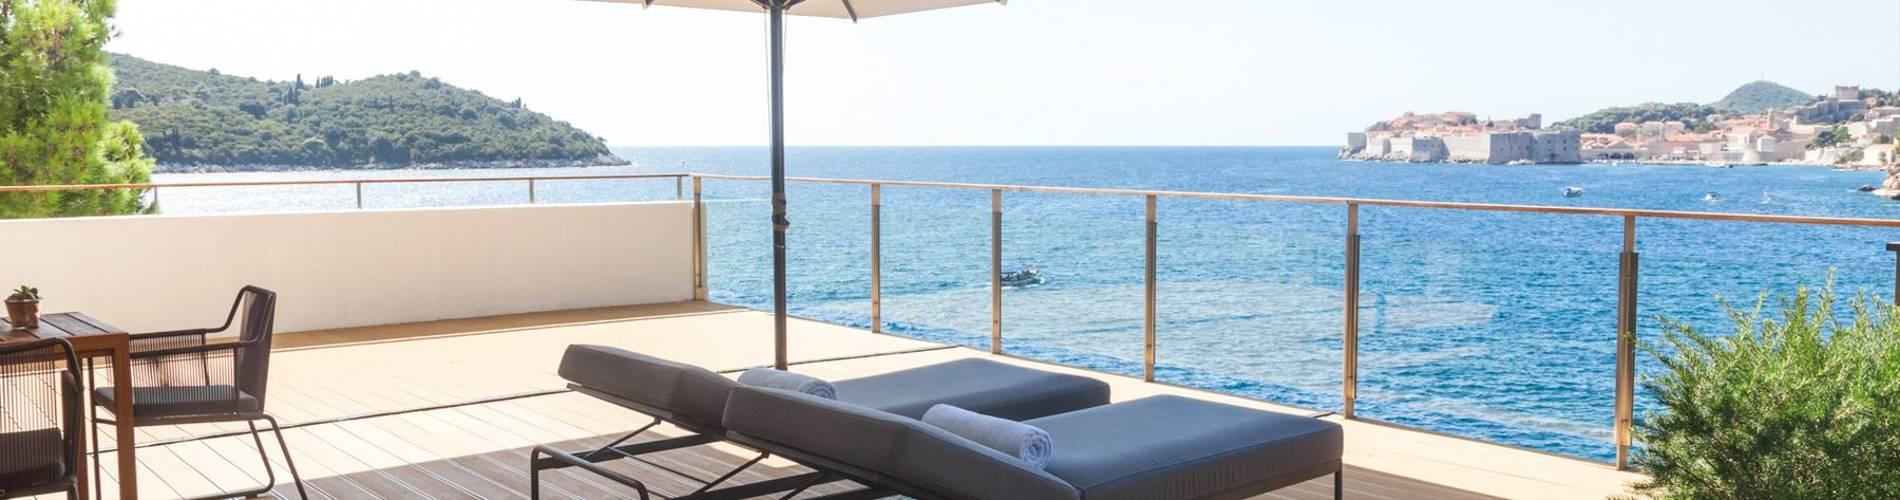 Shaded sunloungers at Hotel Villa Dubrovnik.jpg